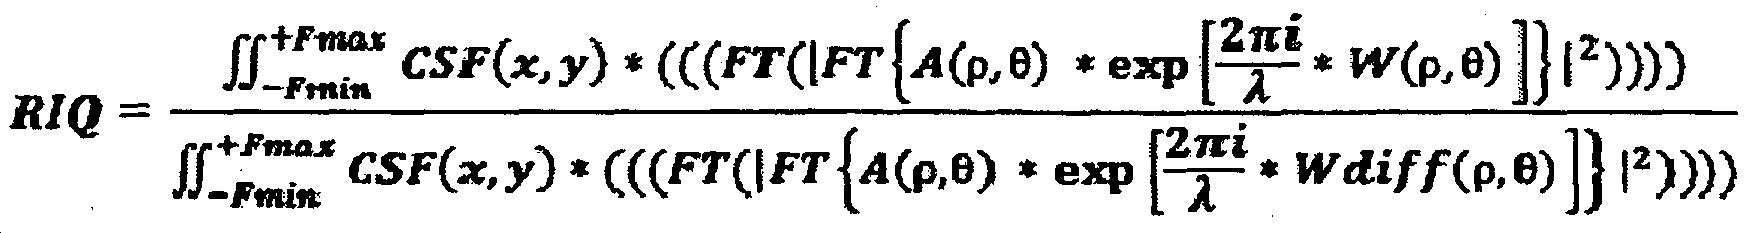 Figure 112014105016158-pct00028